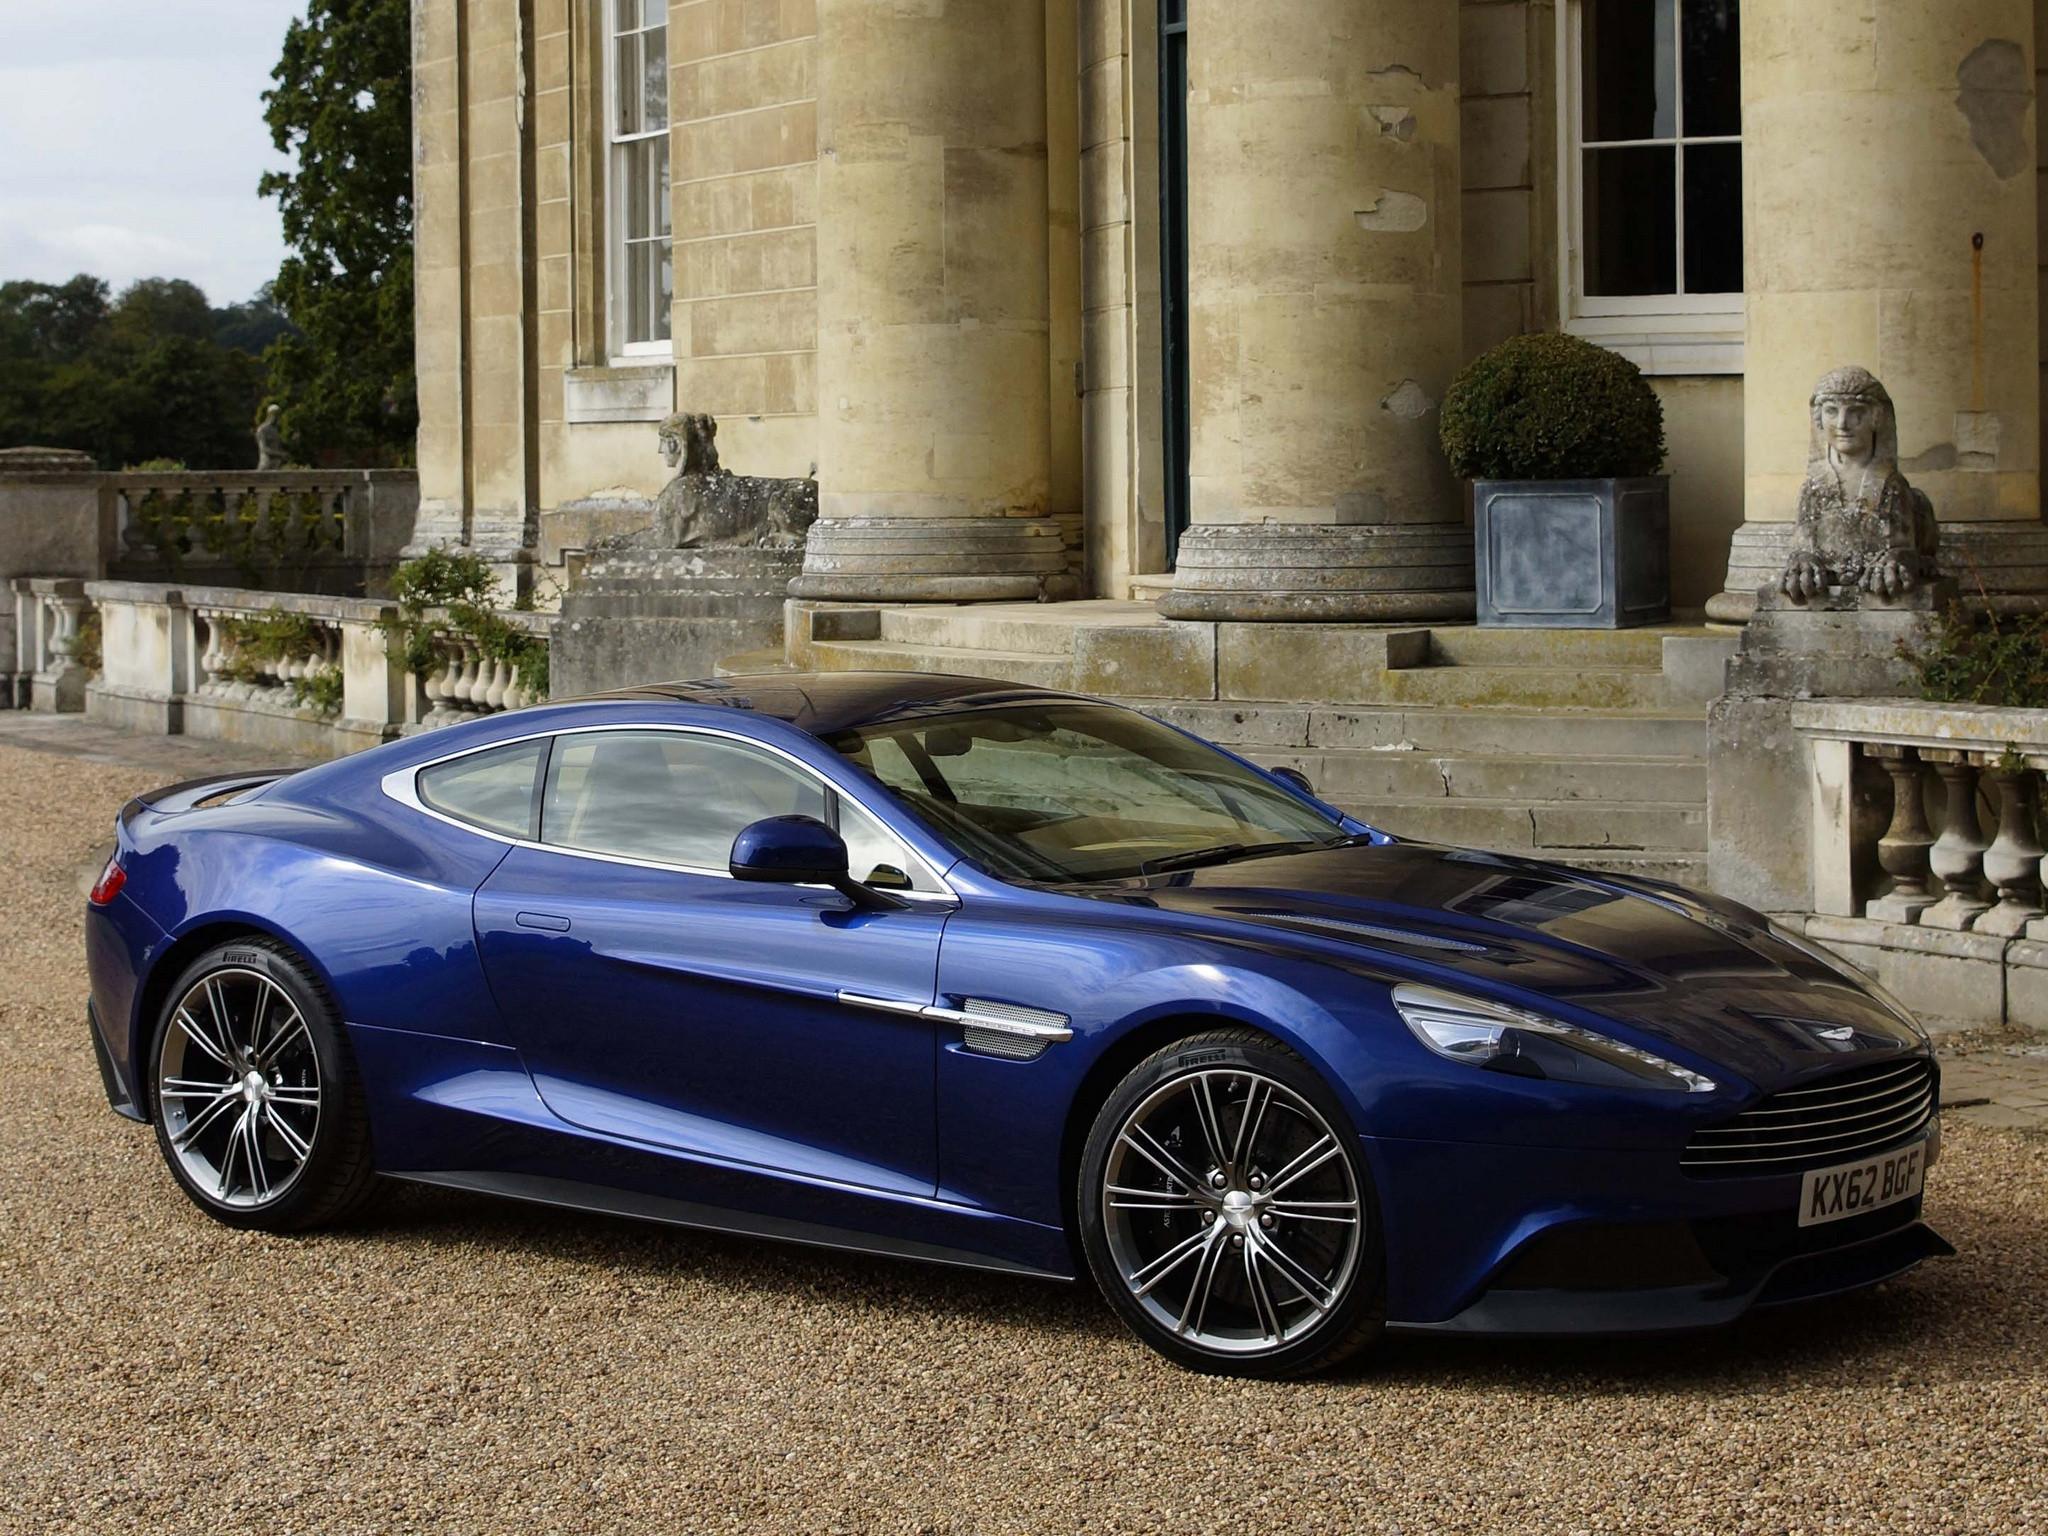 Aston Martin Vanquish Hd Wallpaper Background Image 2048x1536 Id 649444 Wallpaper Abyss